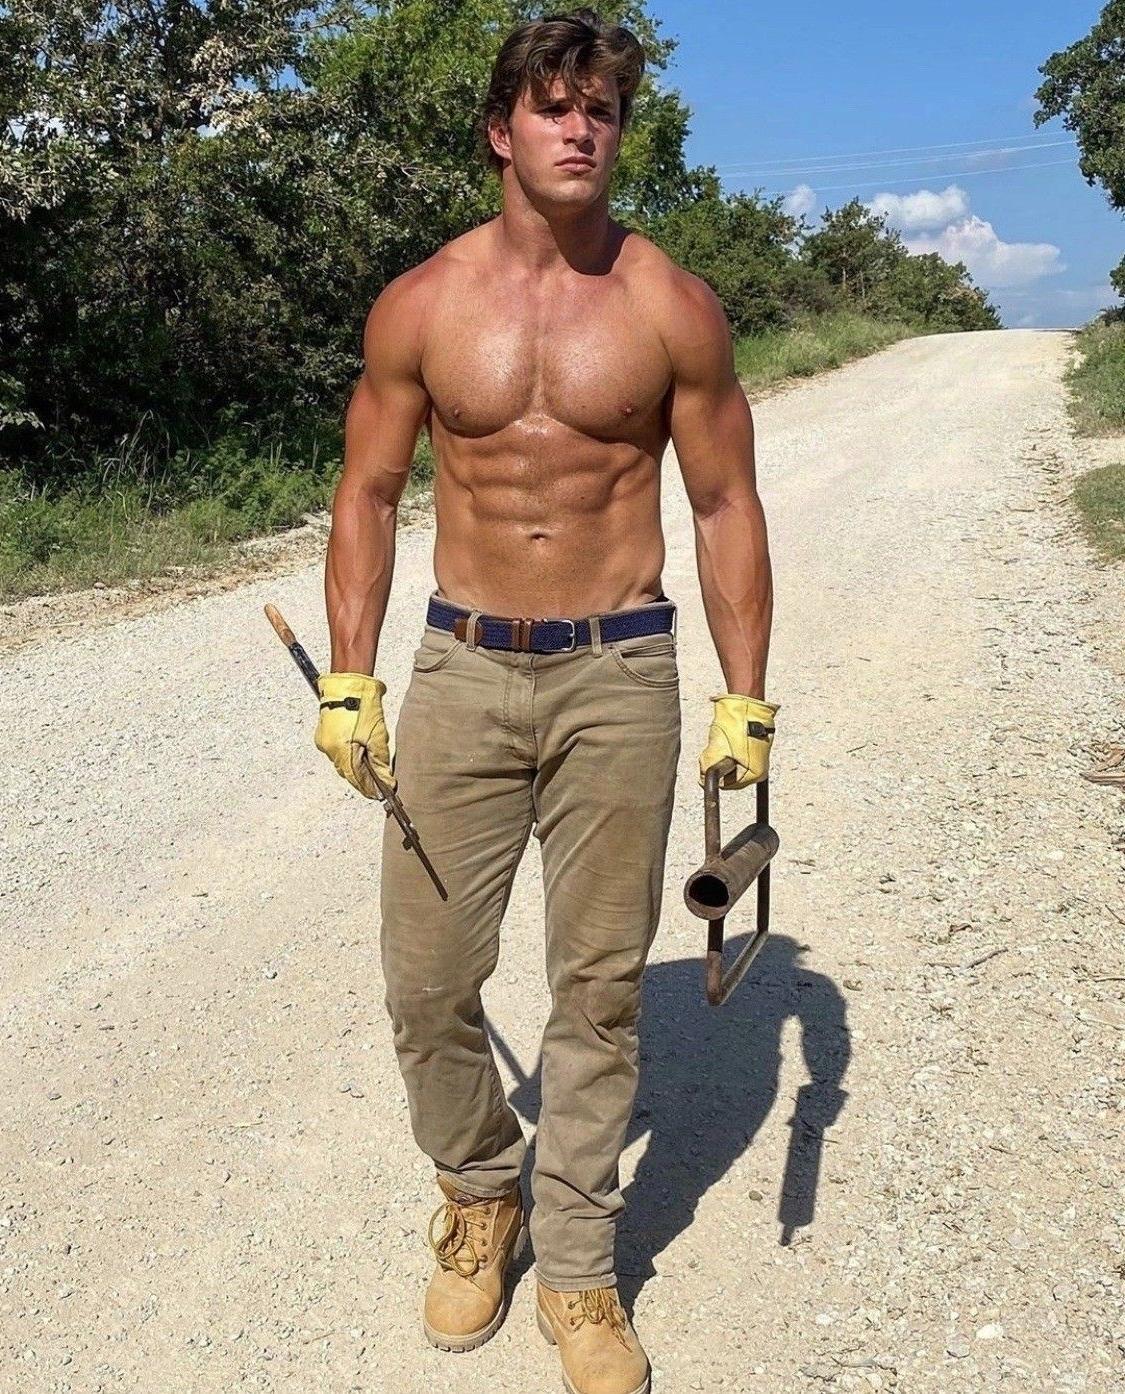 young-muscular-shirtless-guy-working-hard-hunky-sweaty-beefy-laborer-bro